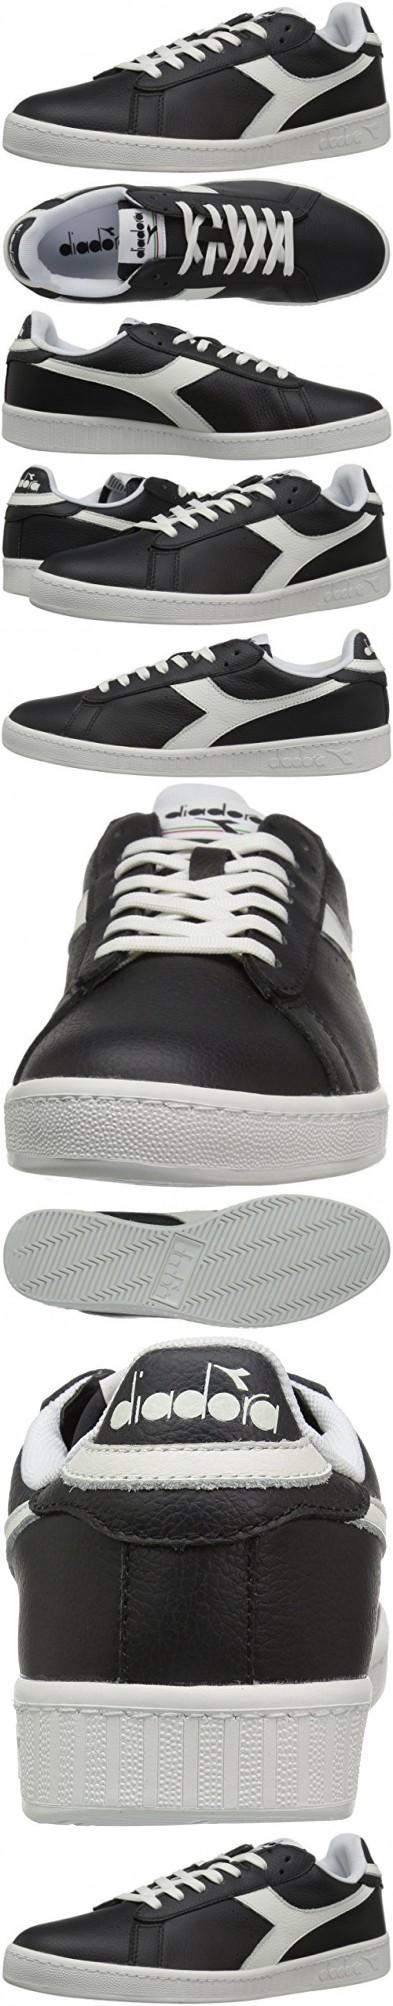 Diadora Men's Game L Low Waxed Court Shoe, BlackWhiteBlack